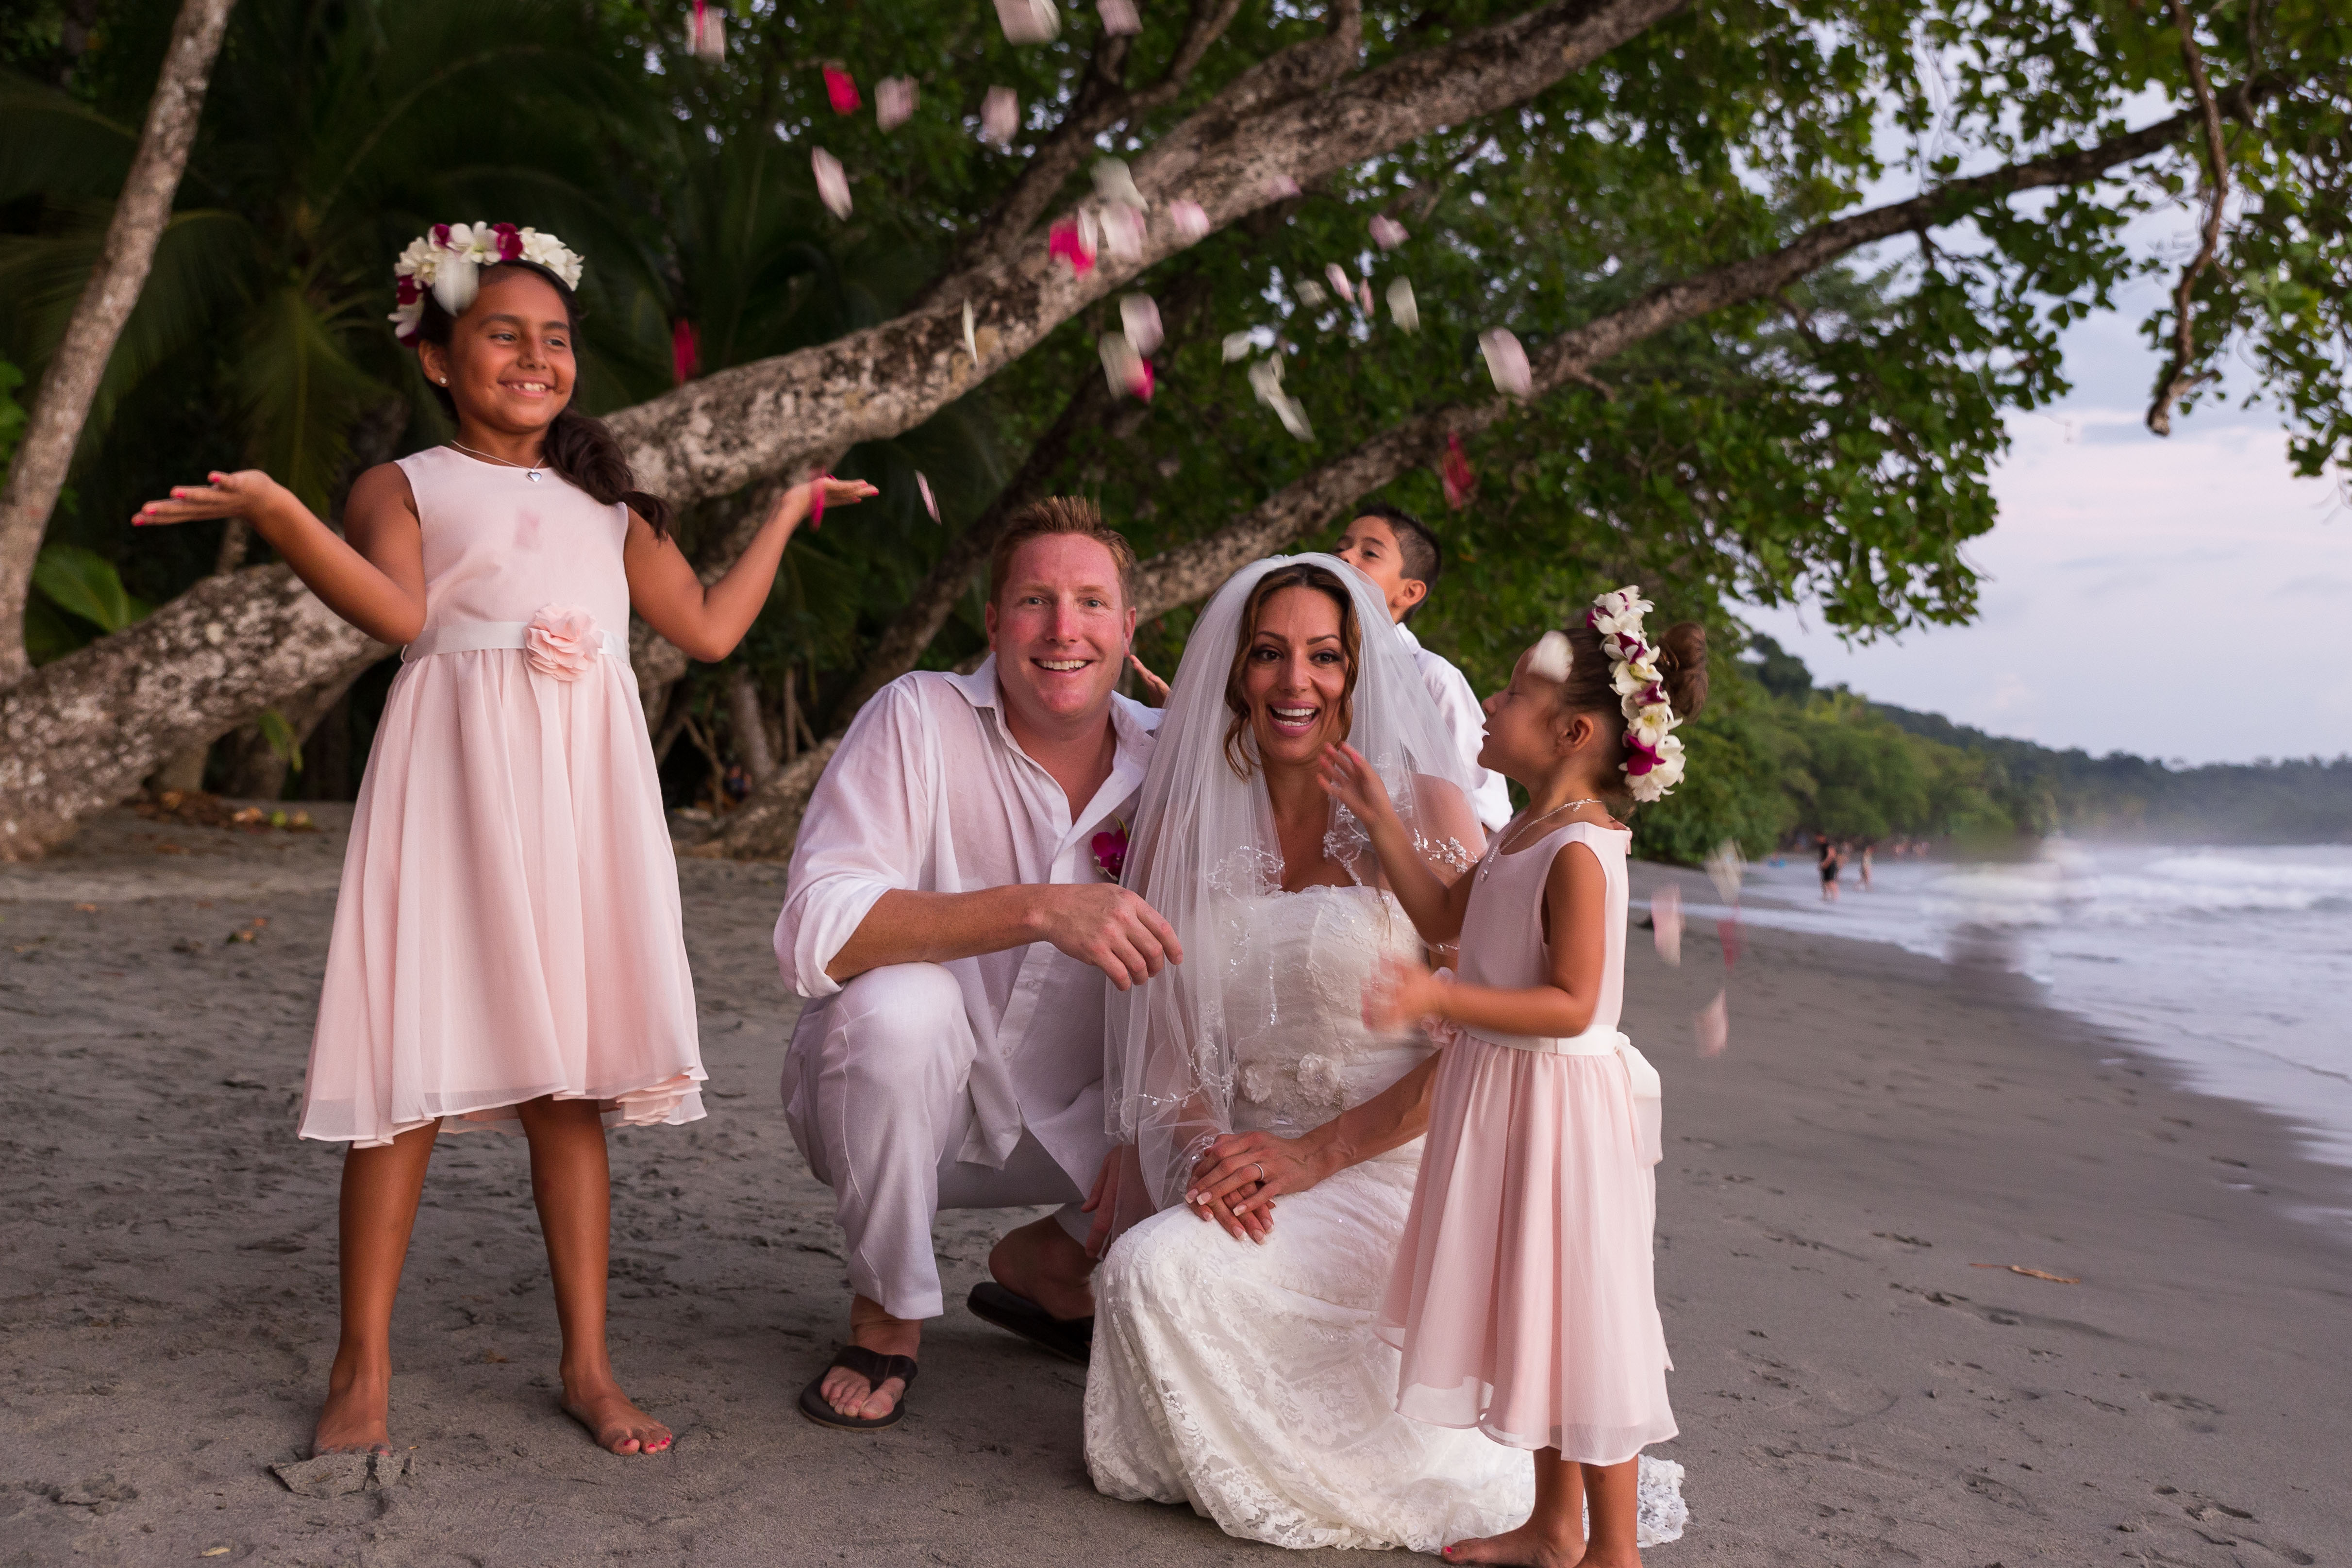 family celebration at the beach